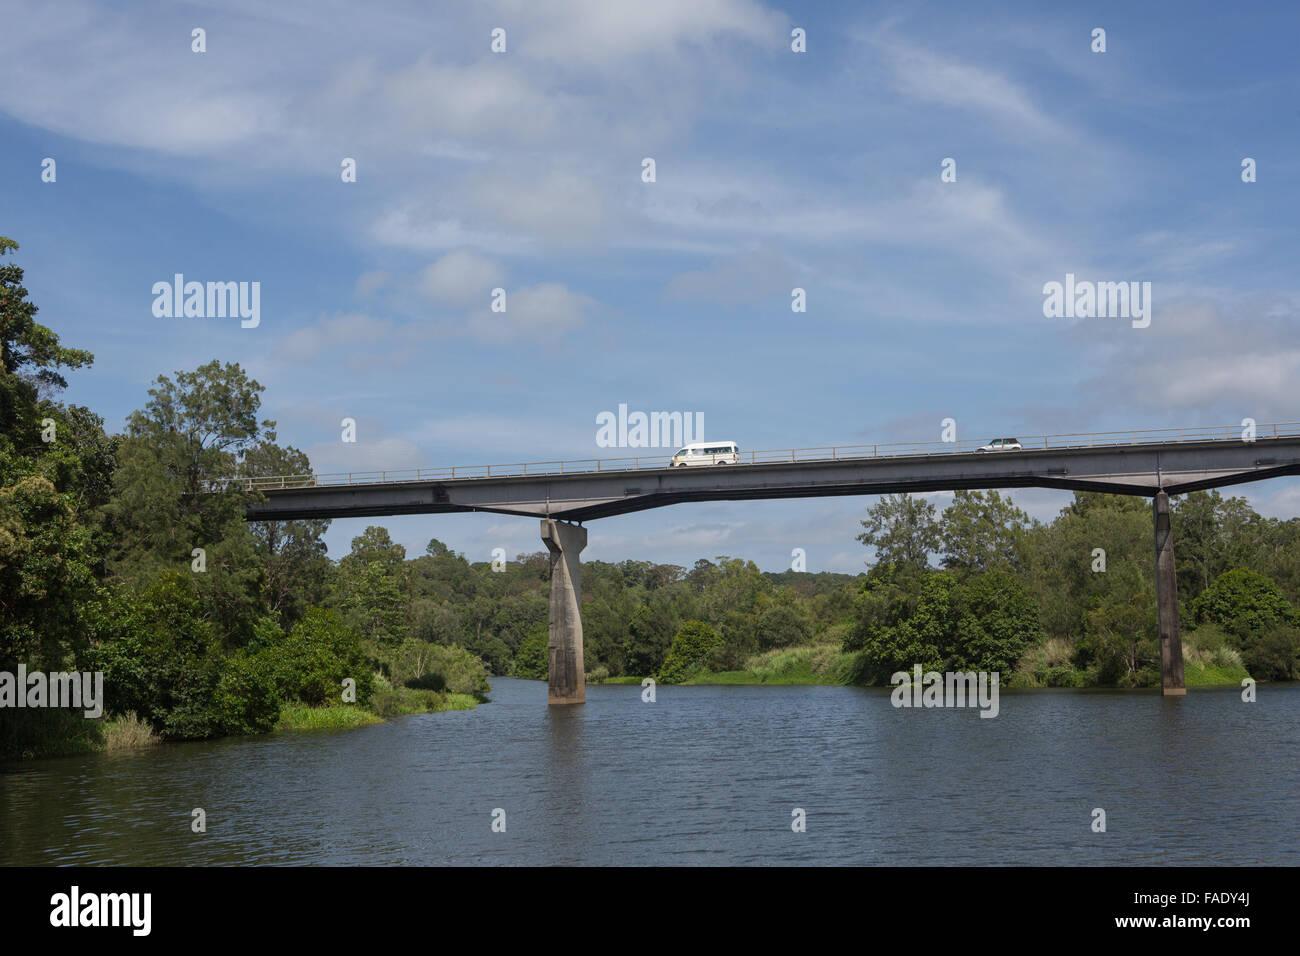 Concrete span bridge Kuranda Queensland - Stock Image